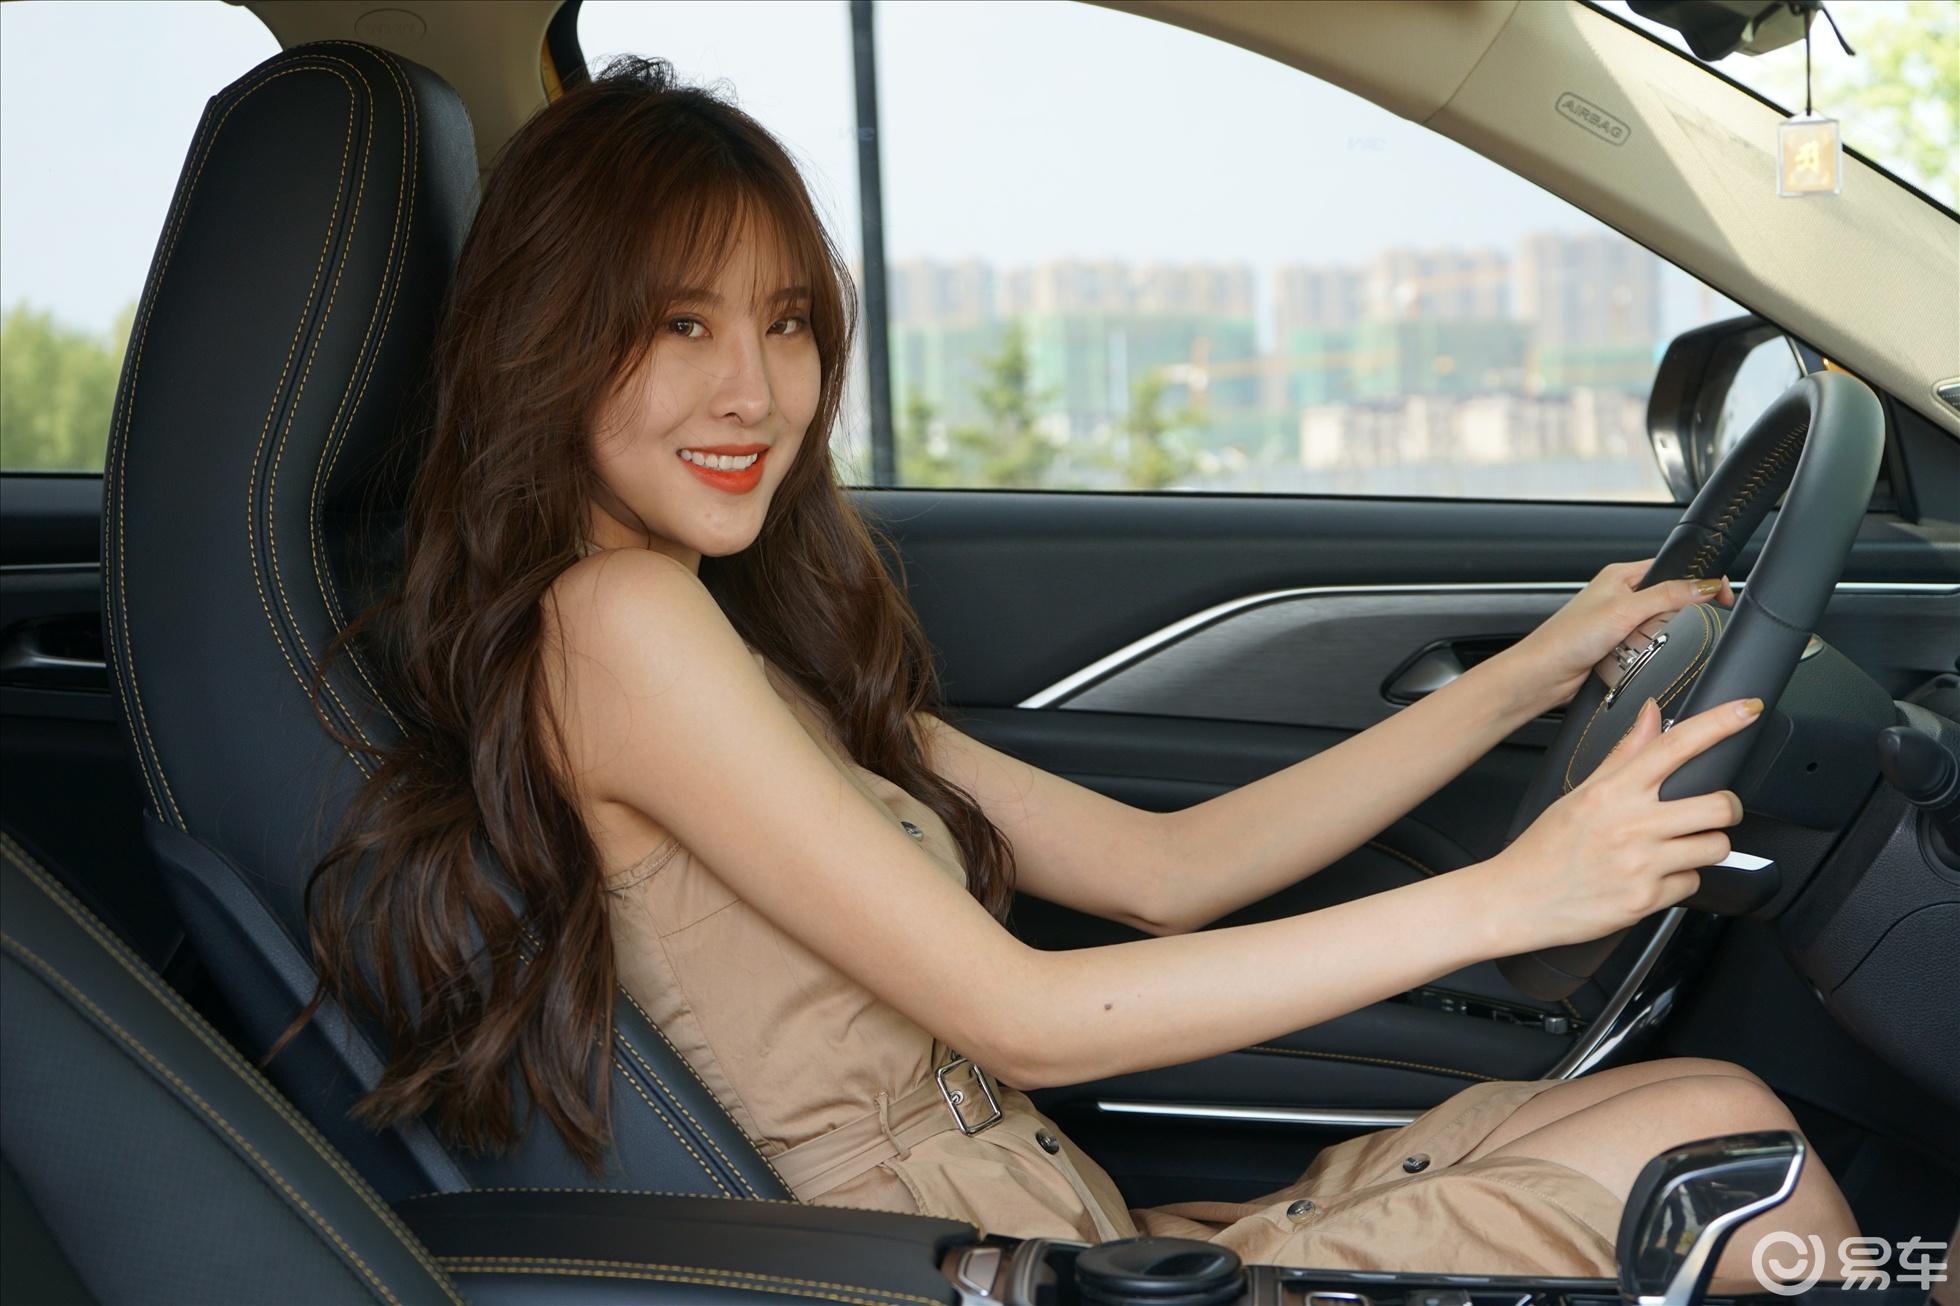 http://www.weixinrensheng.com/qichekong/356279.html